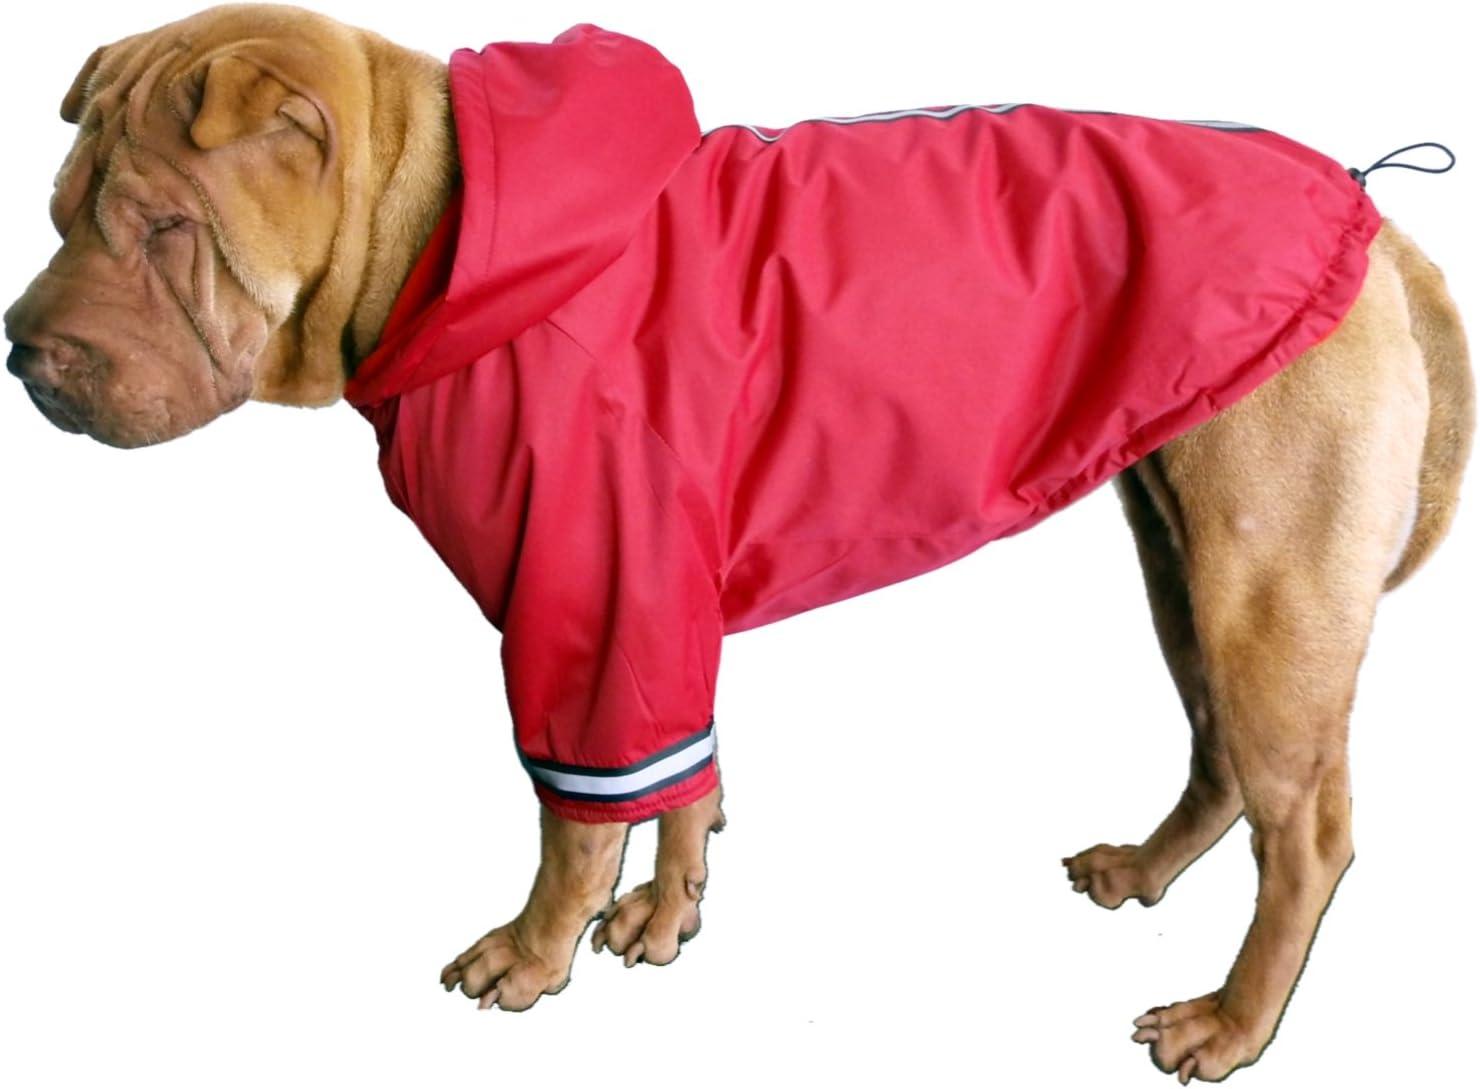 federleicht wasserabweisend Top Qualit/ät mit Reflektionsstreifen Dogs Stars Hundemantel Football rot Kapuze abnehmbar flauschig gef/üttert